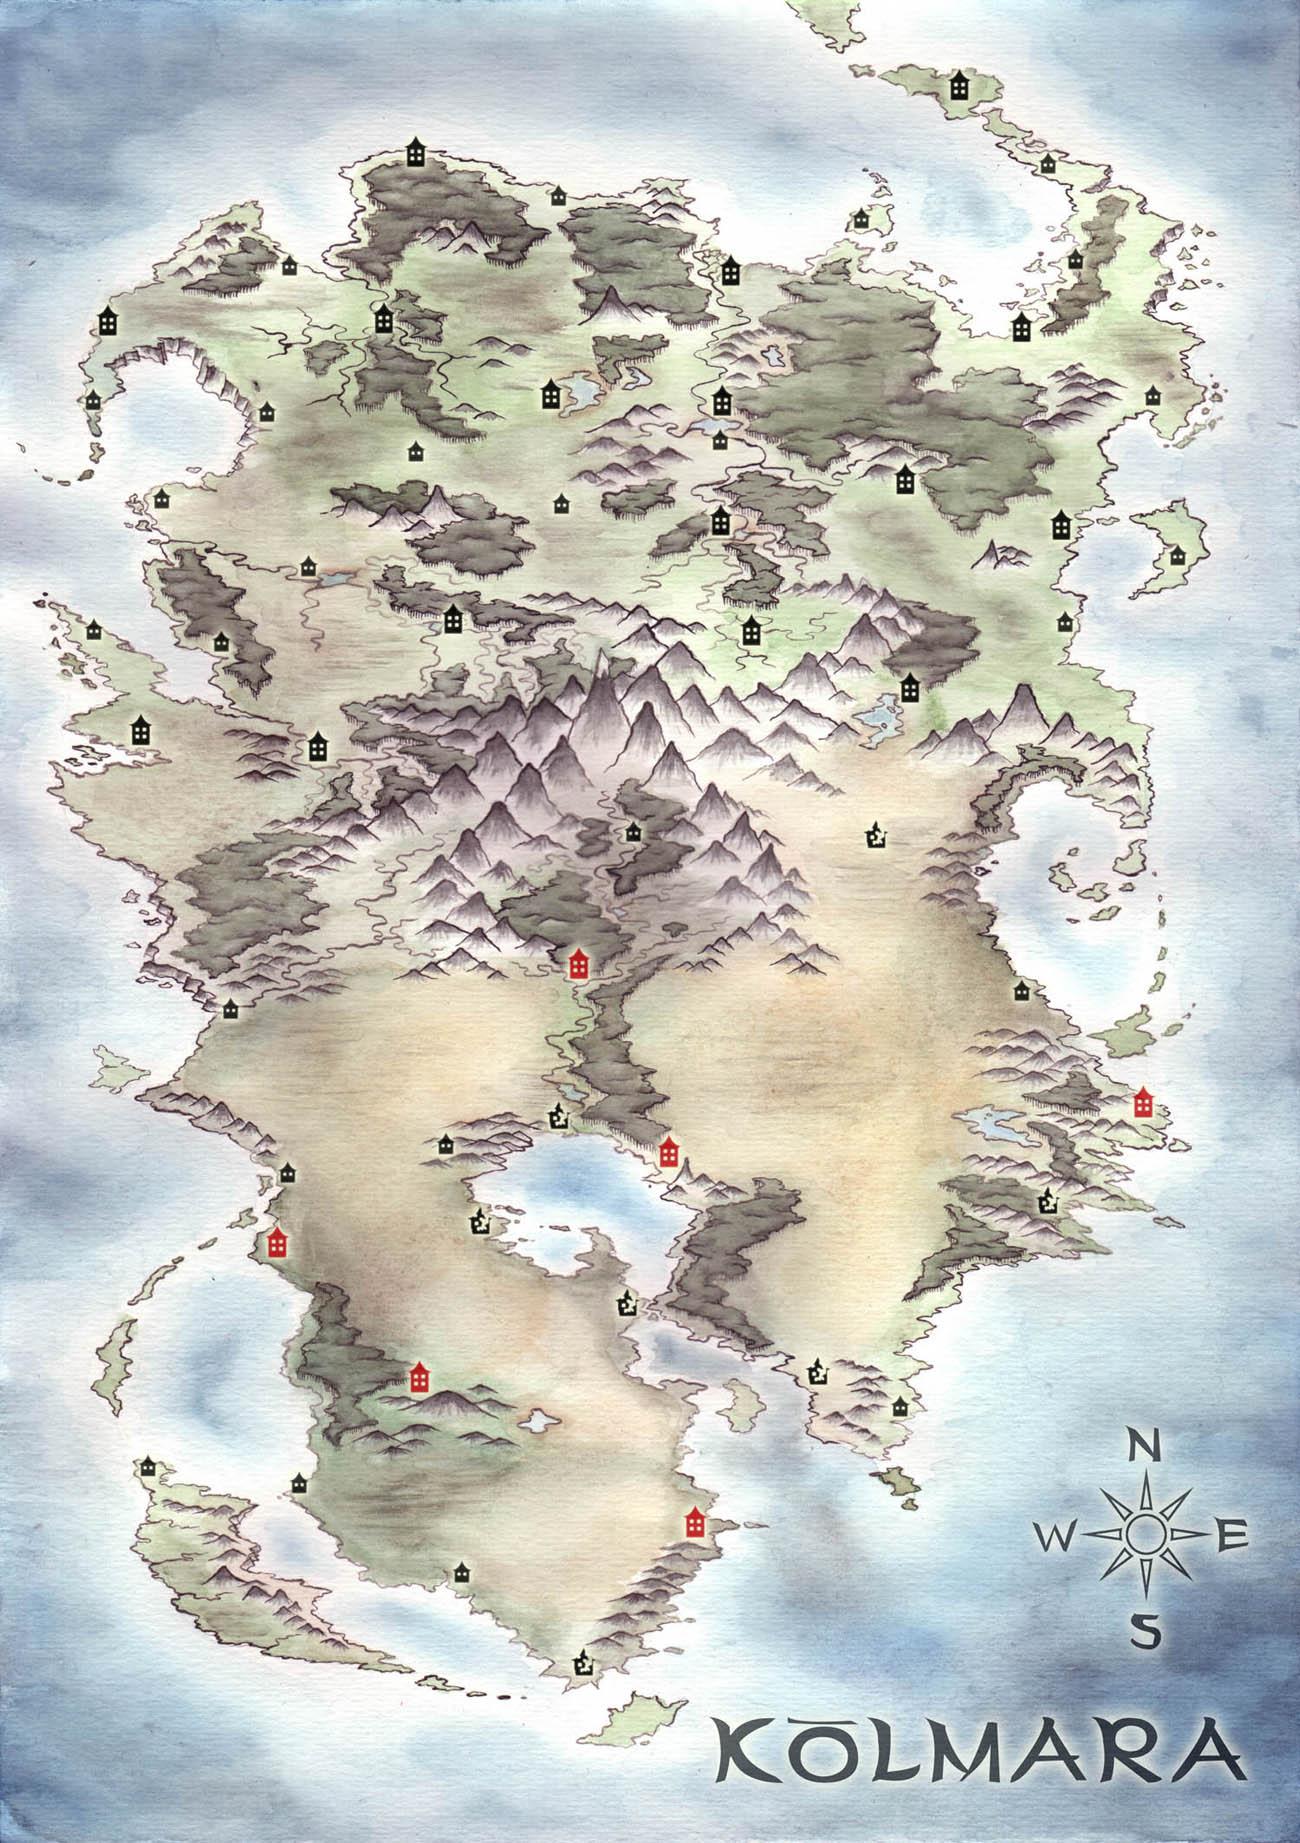 Kolmara, fantasy map by LingonB